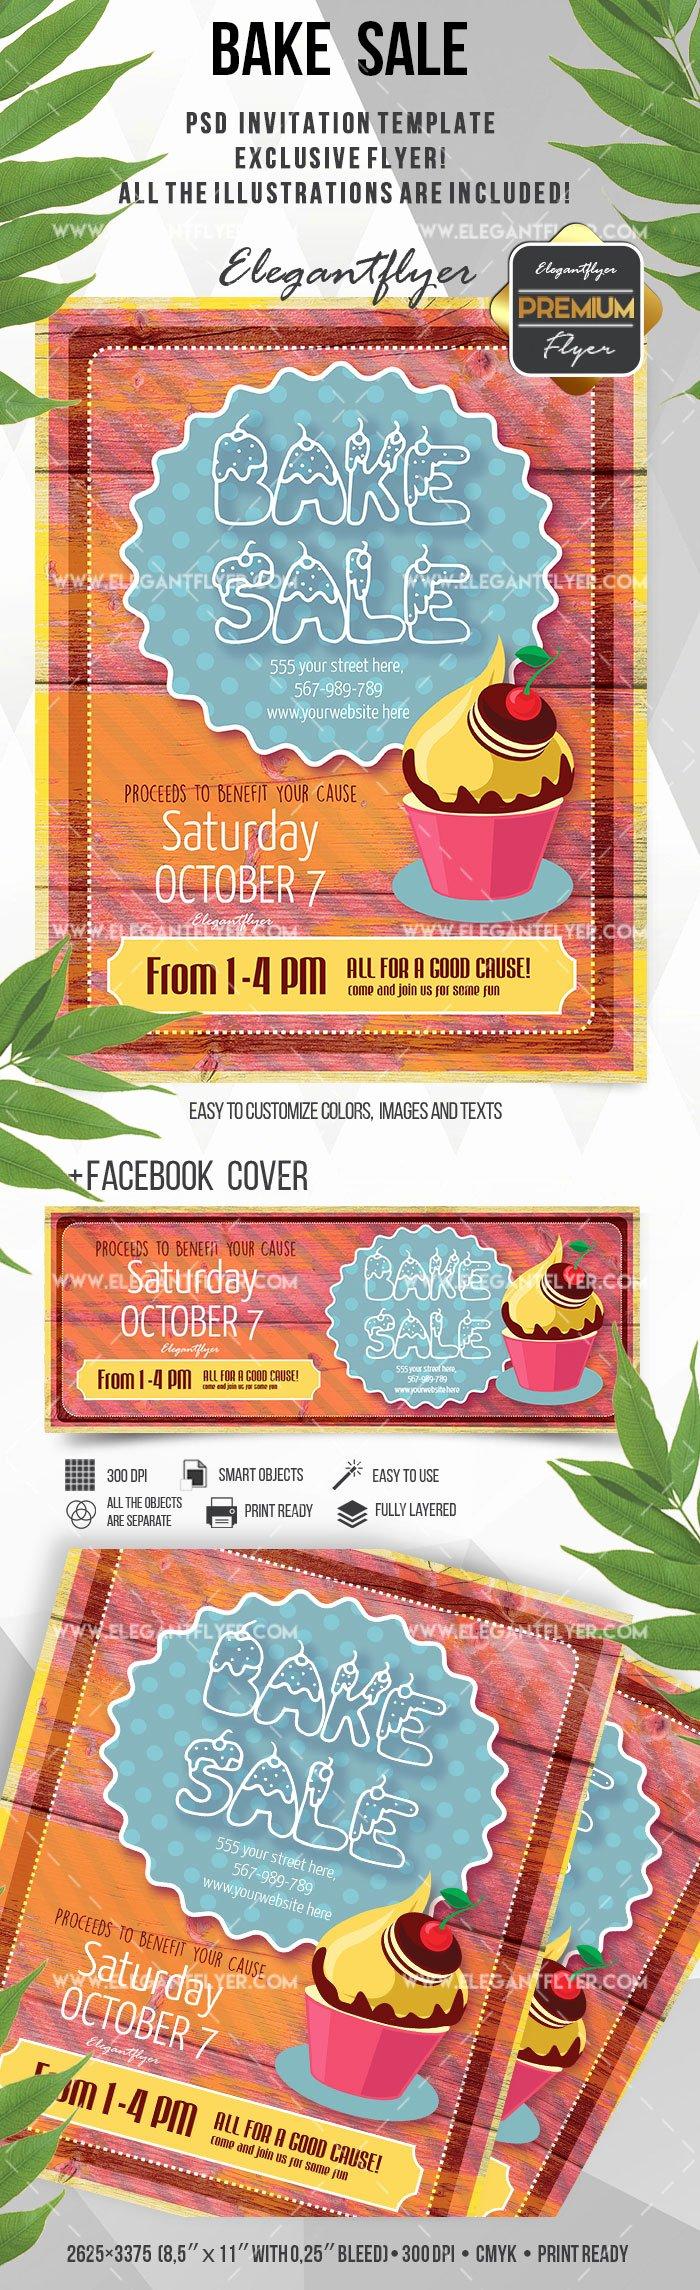 bake sale flyer invitation template 2